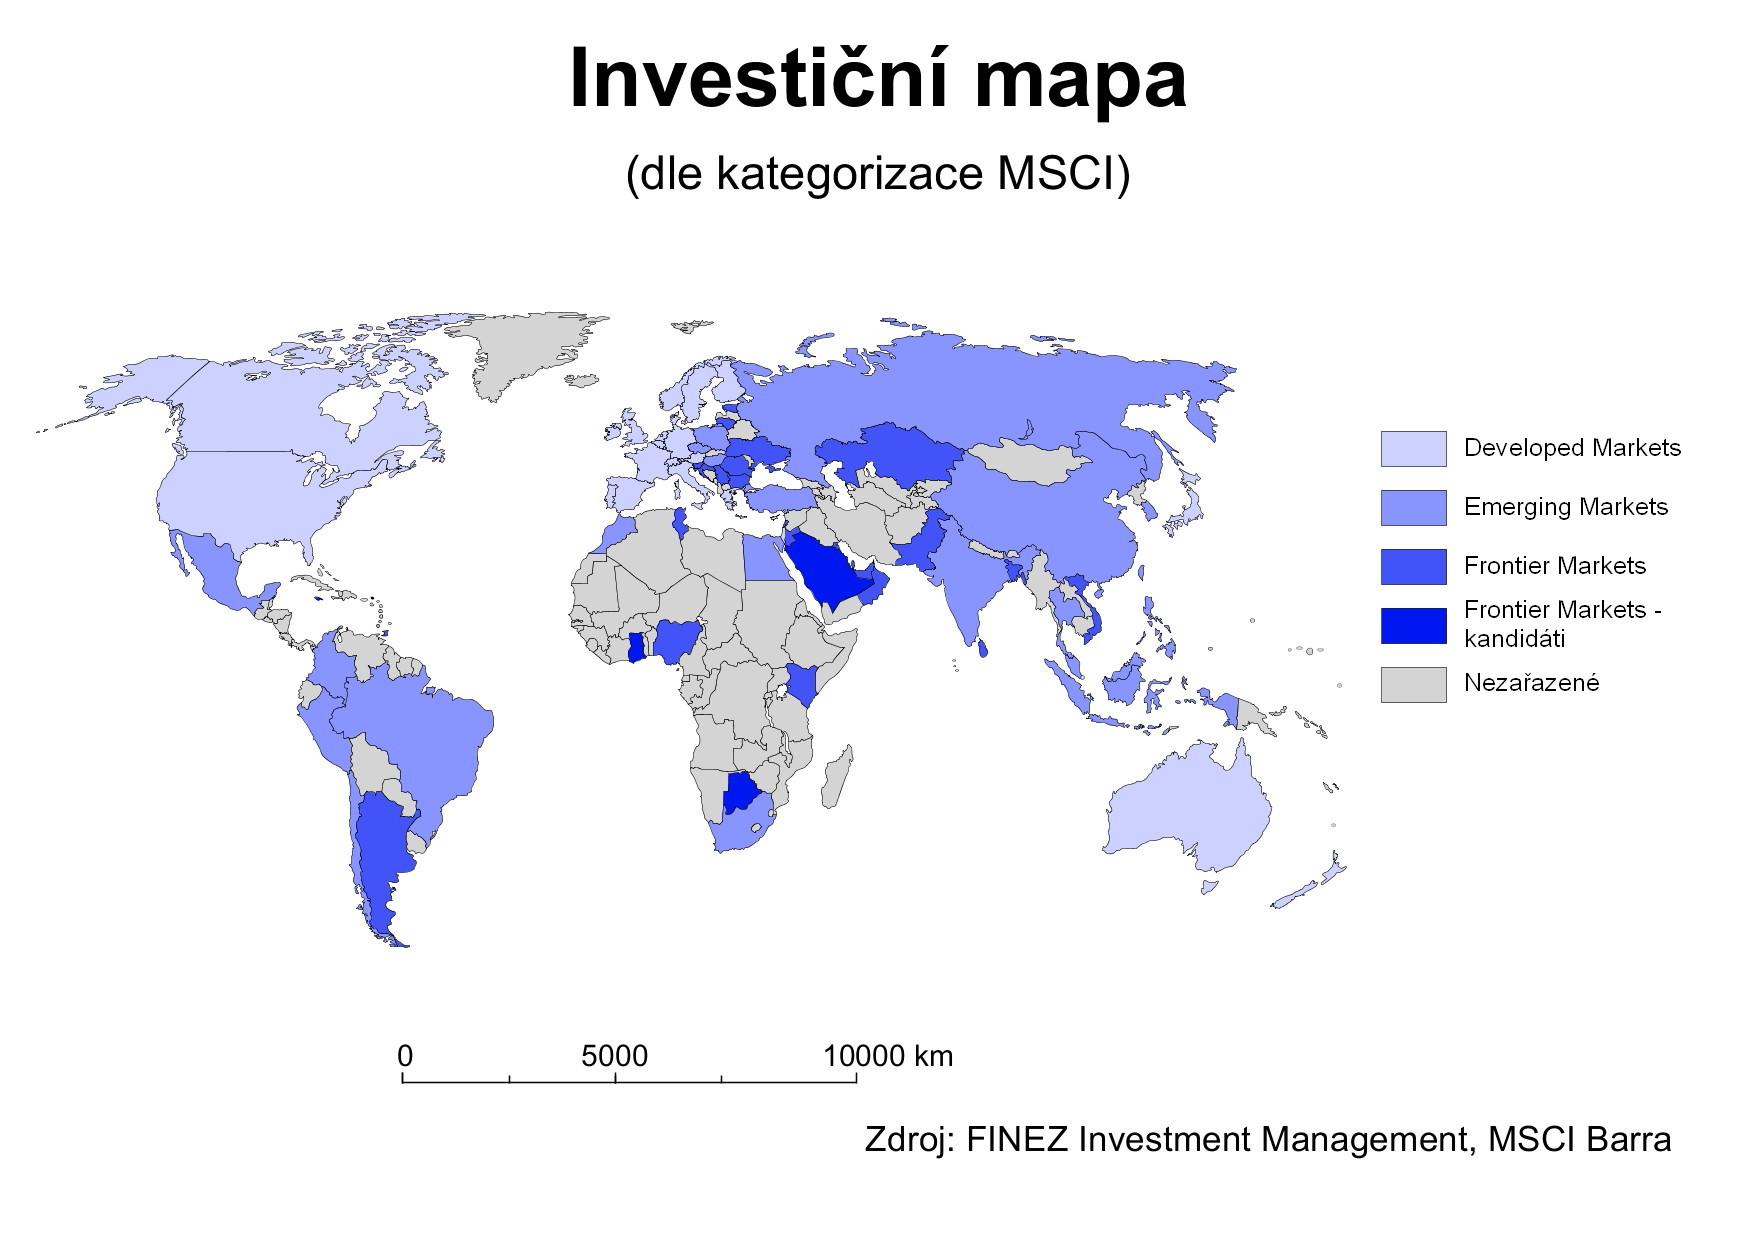 2010_10_06_Investicni_mapa_MSCI.jpg